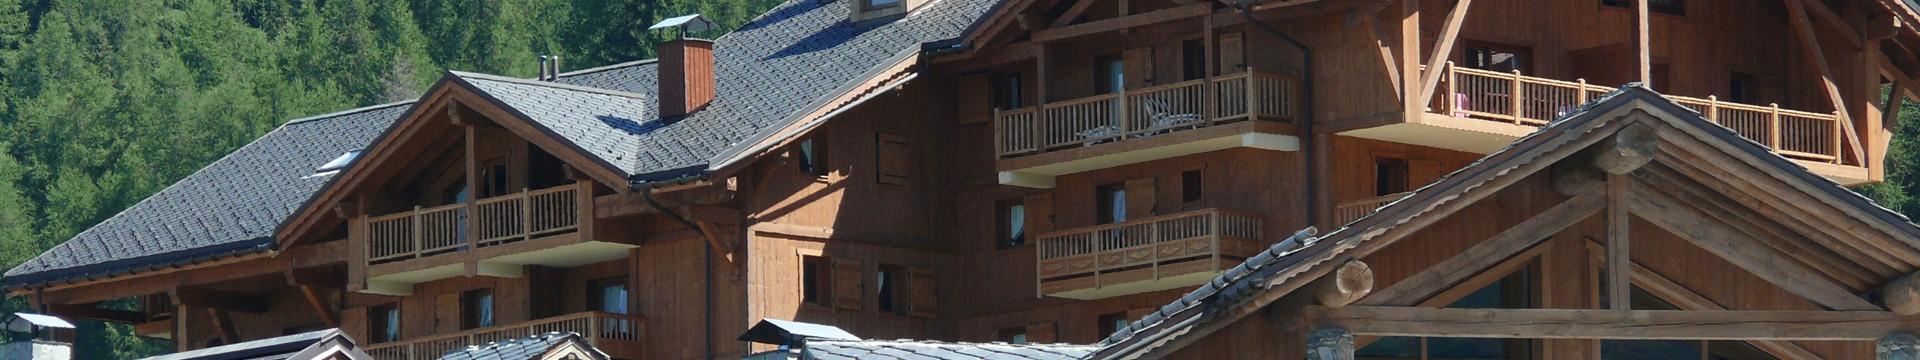 residences-9335